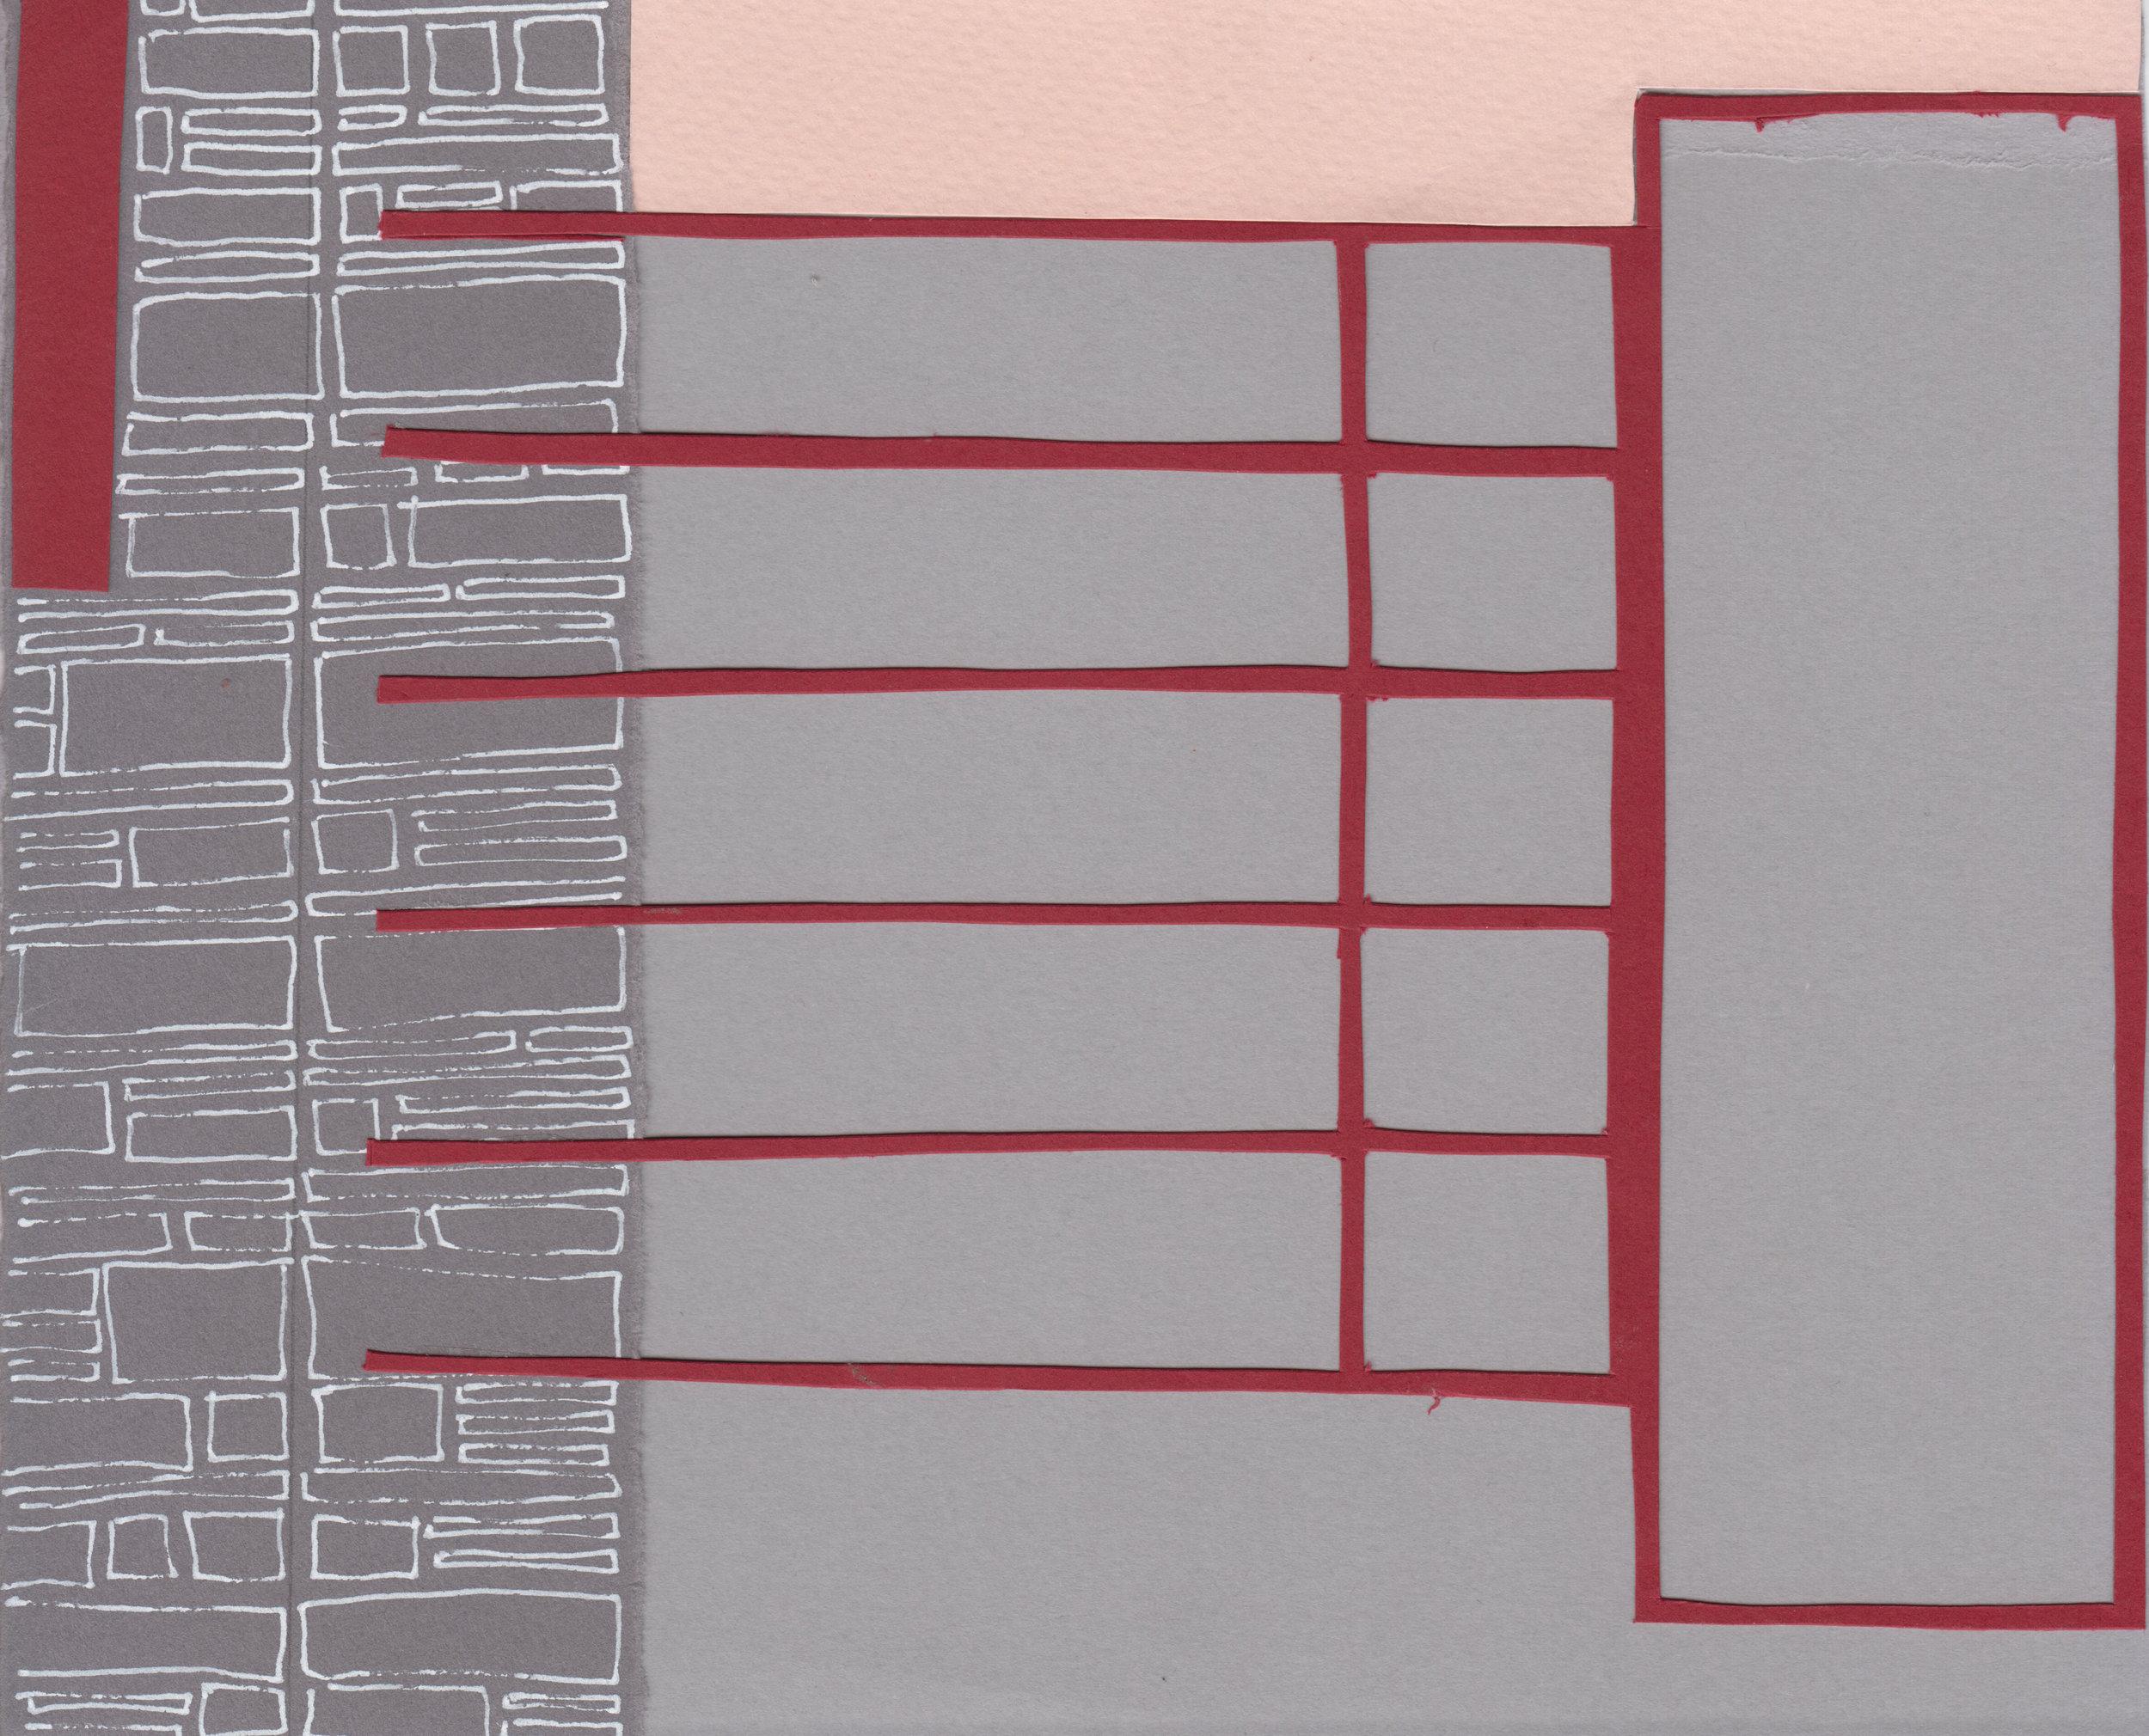 Eleanor_Pritchard_Fallingwater_window_frames_papercut.jpg